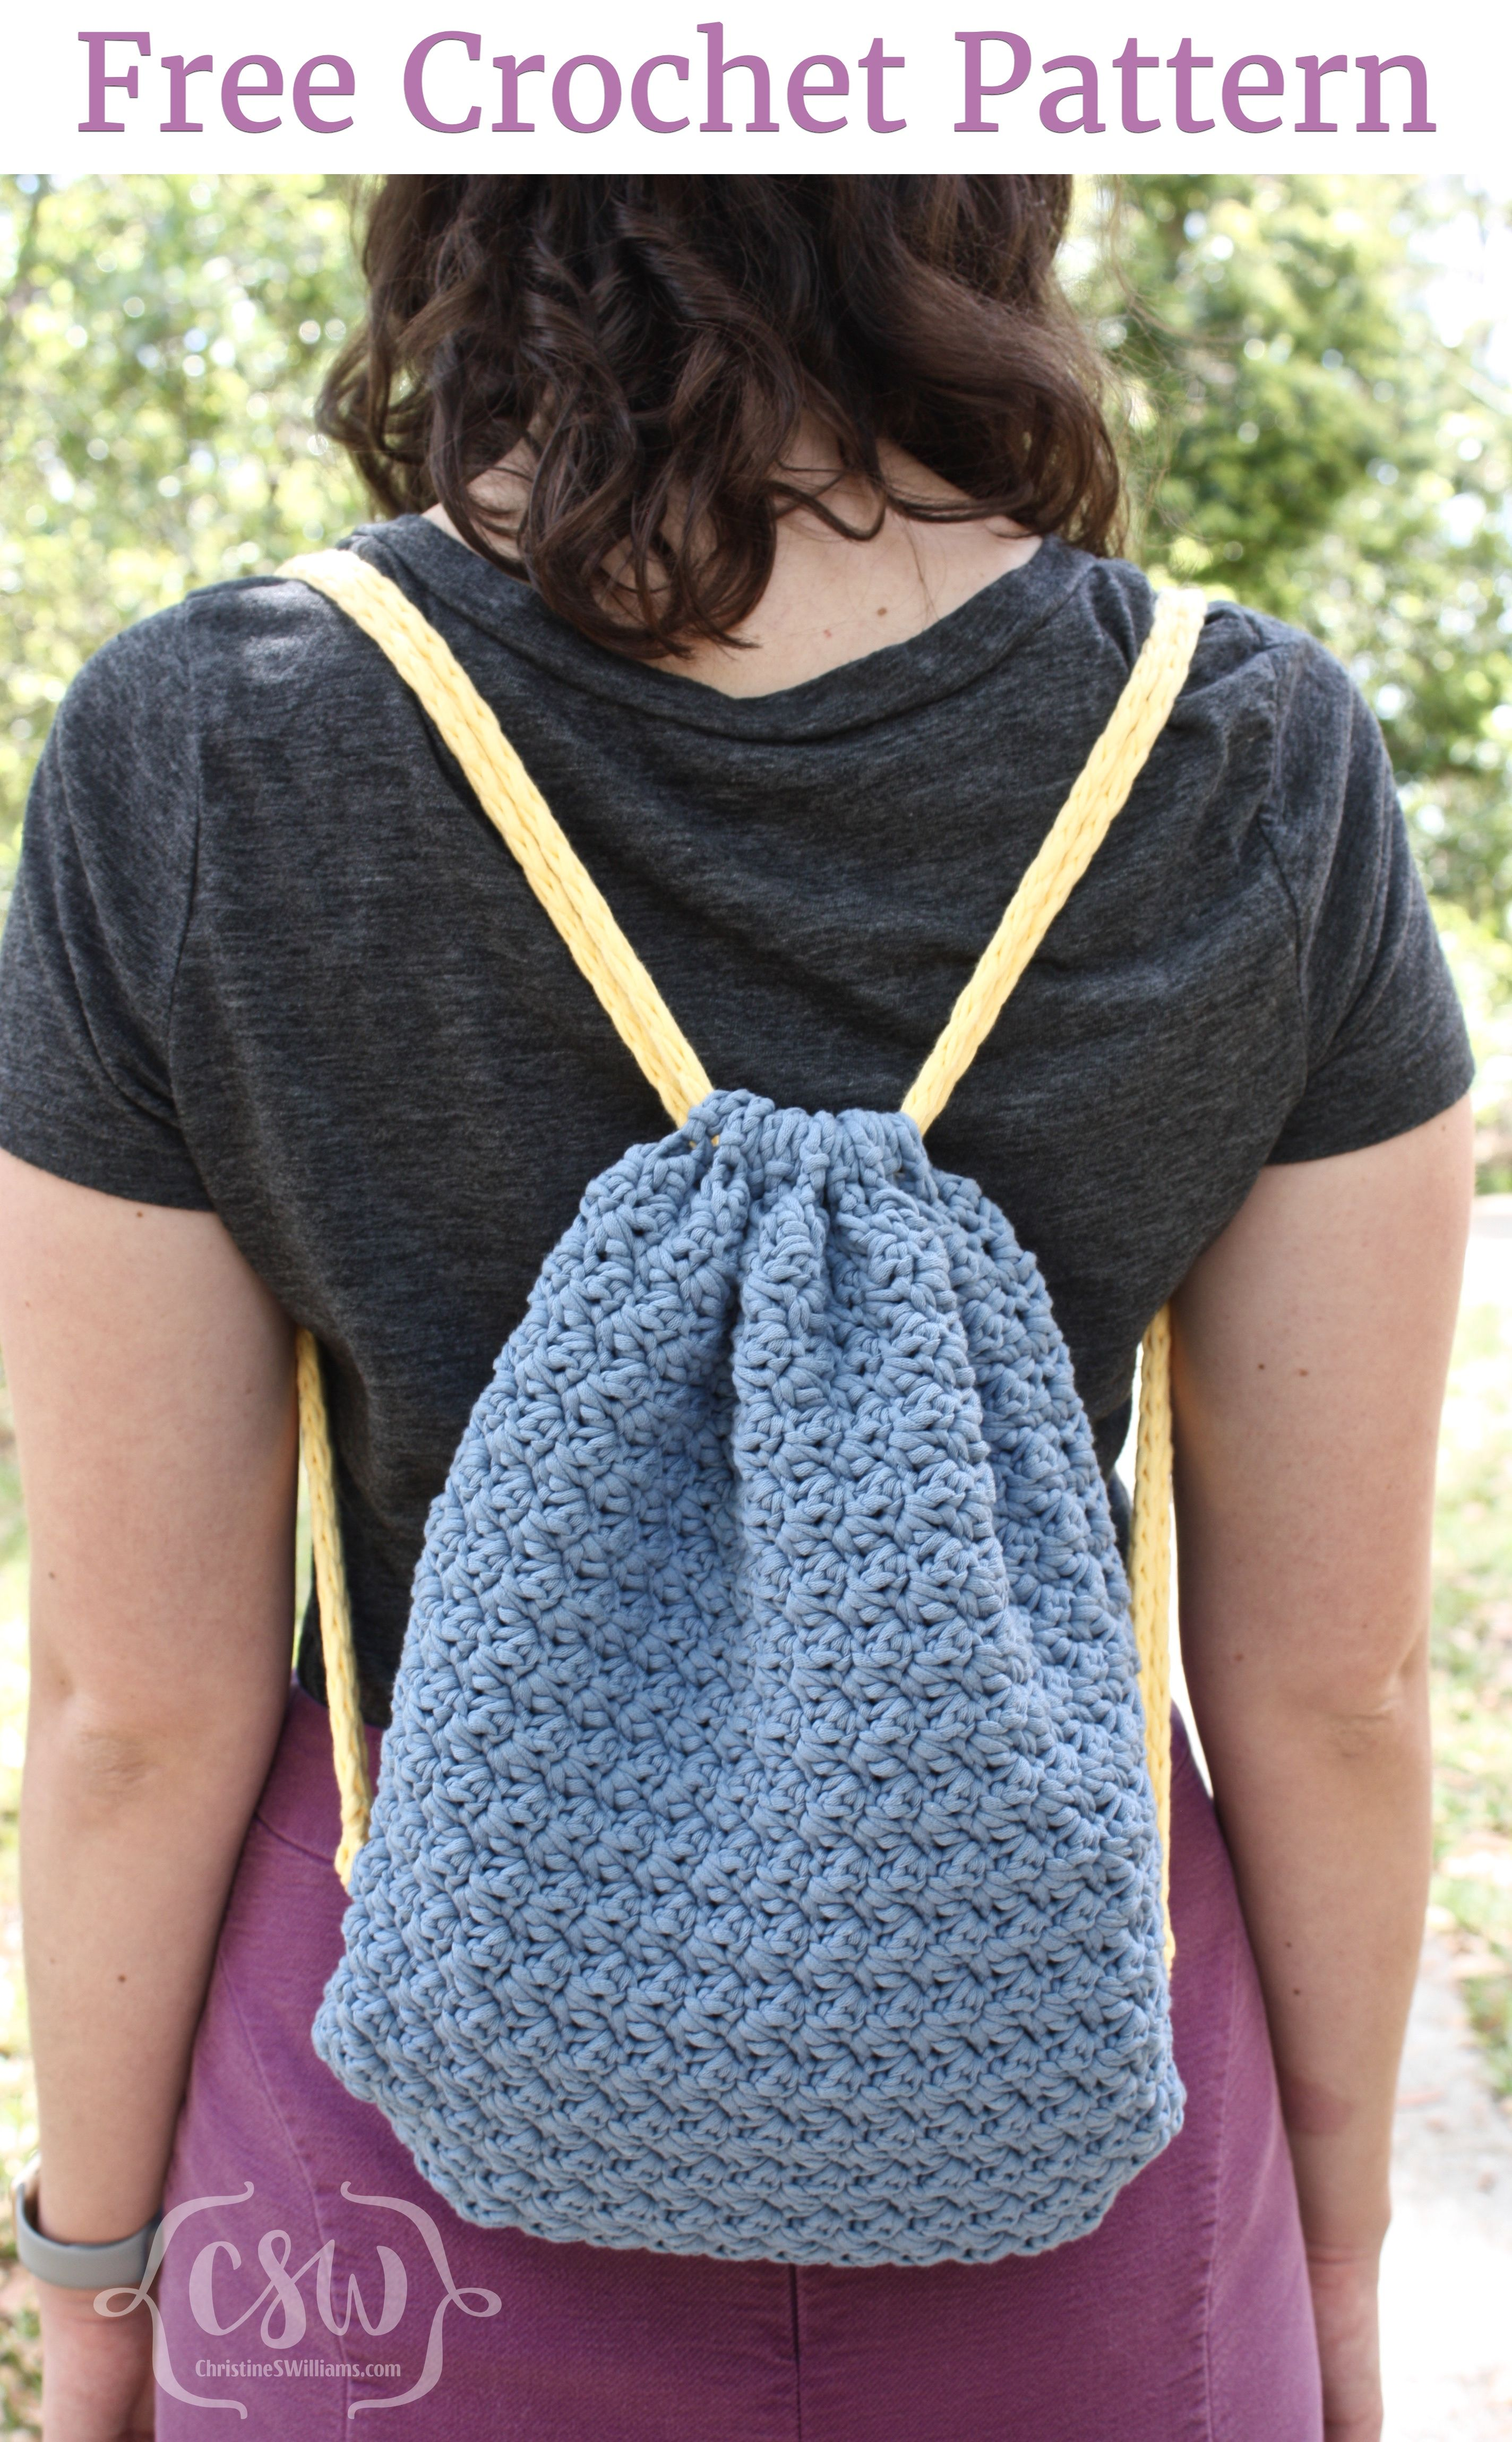 Summer Drawstring Backpack Colorful Christine Crochet Drawstring Bag Drawstring Backpack Pattern Crochet Backpack